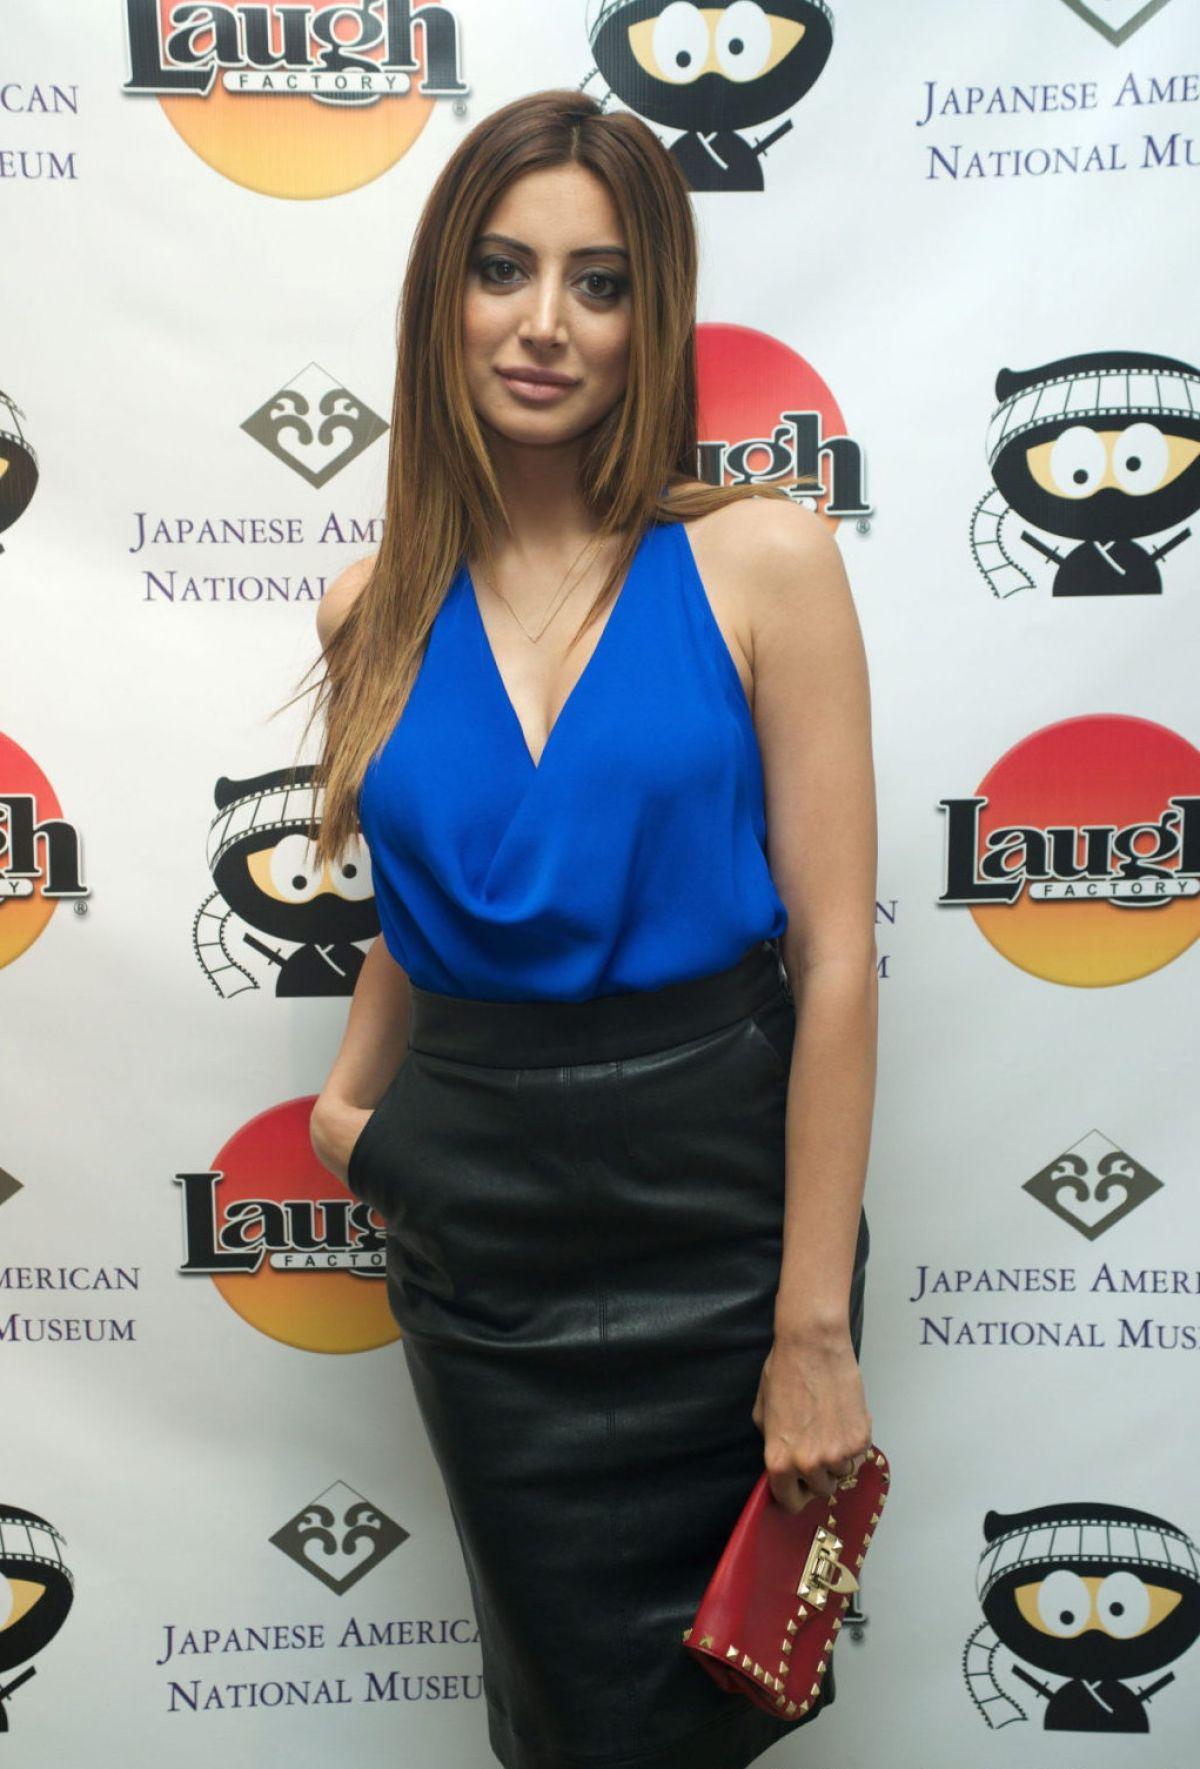 NOUREEN DEWULF at Comedy Ninja Film Festival Opening Night in Los Angeles